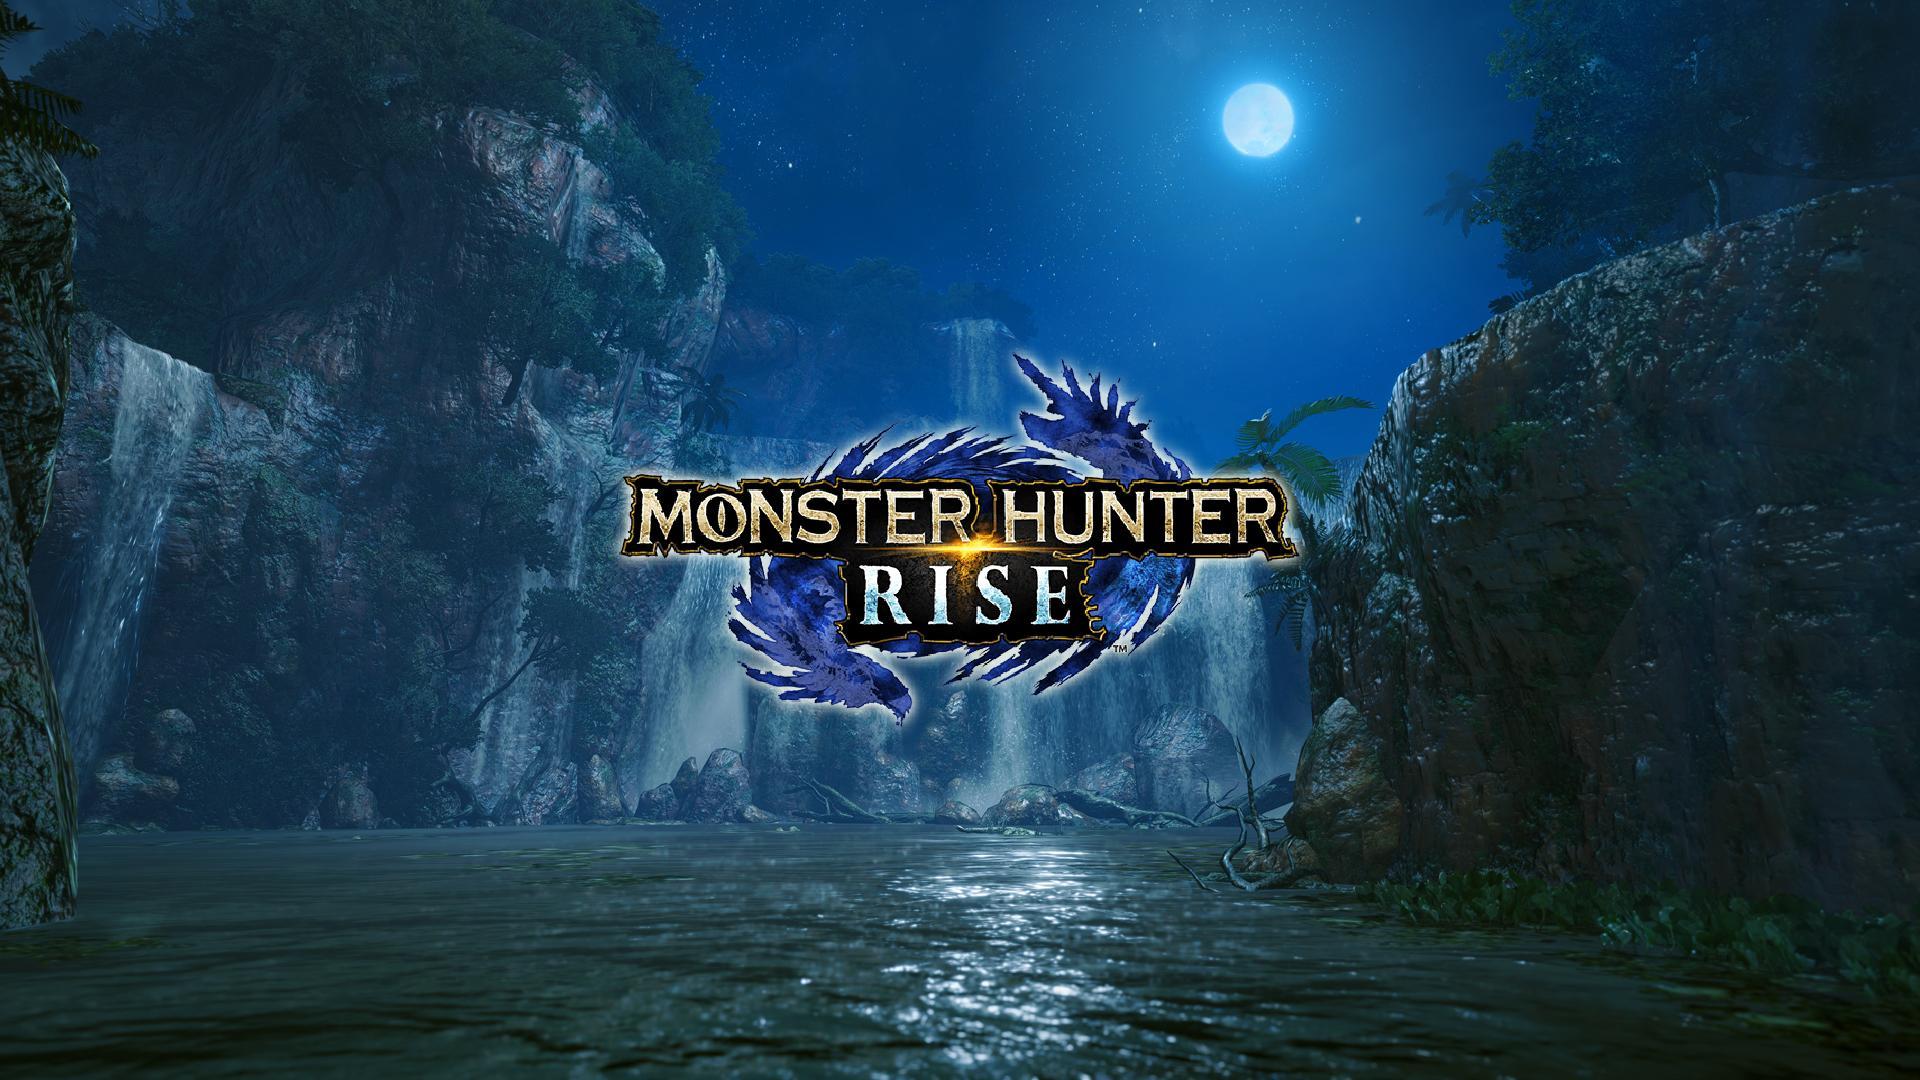 Se revelan los requisitos de Monster Hunter Rise para PC, GamersRD